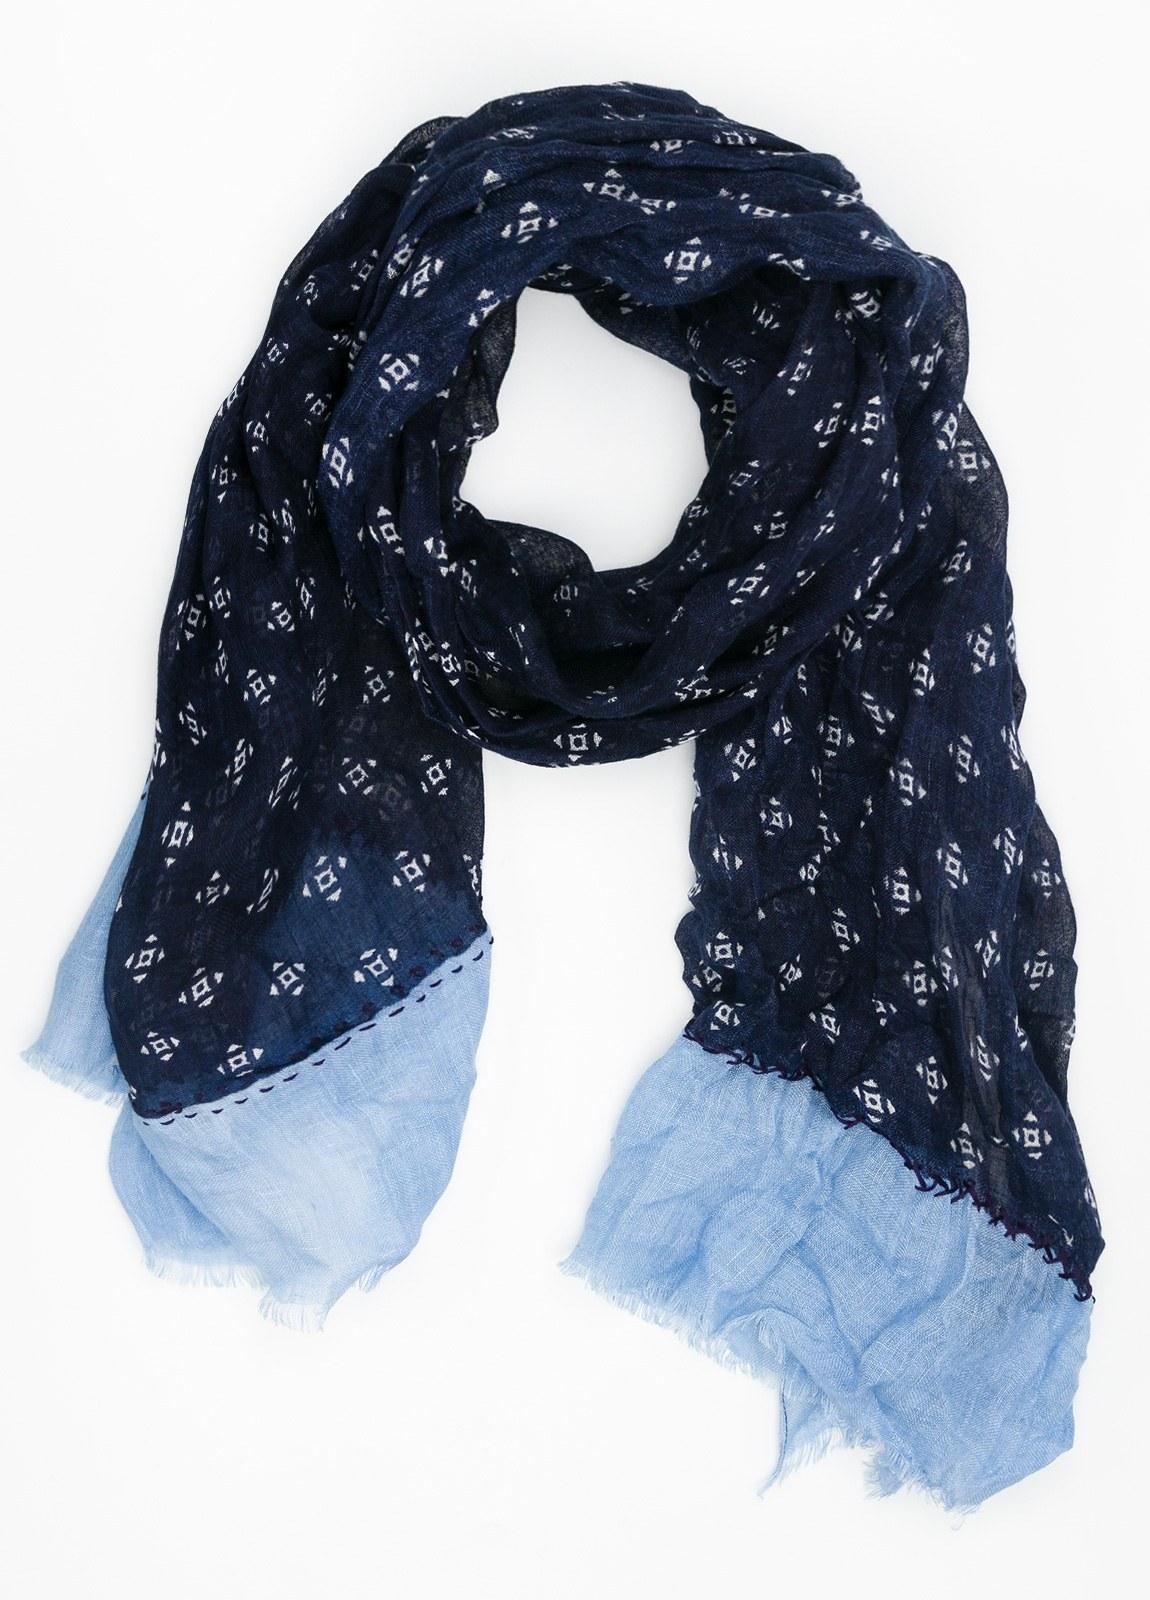 Foulard estampado color azul marino y azul celeste. Modelo 70 X 190 cm. 100% Lino